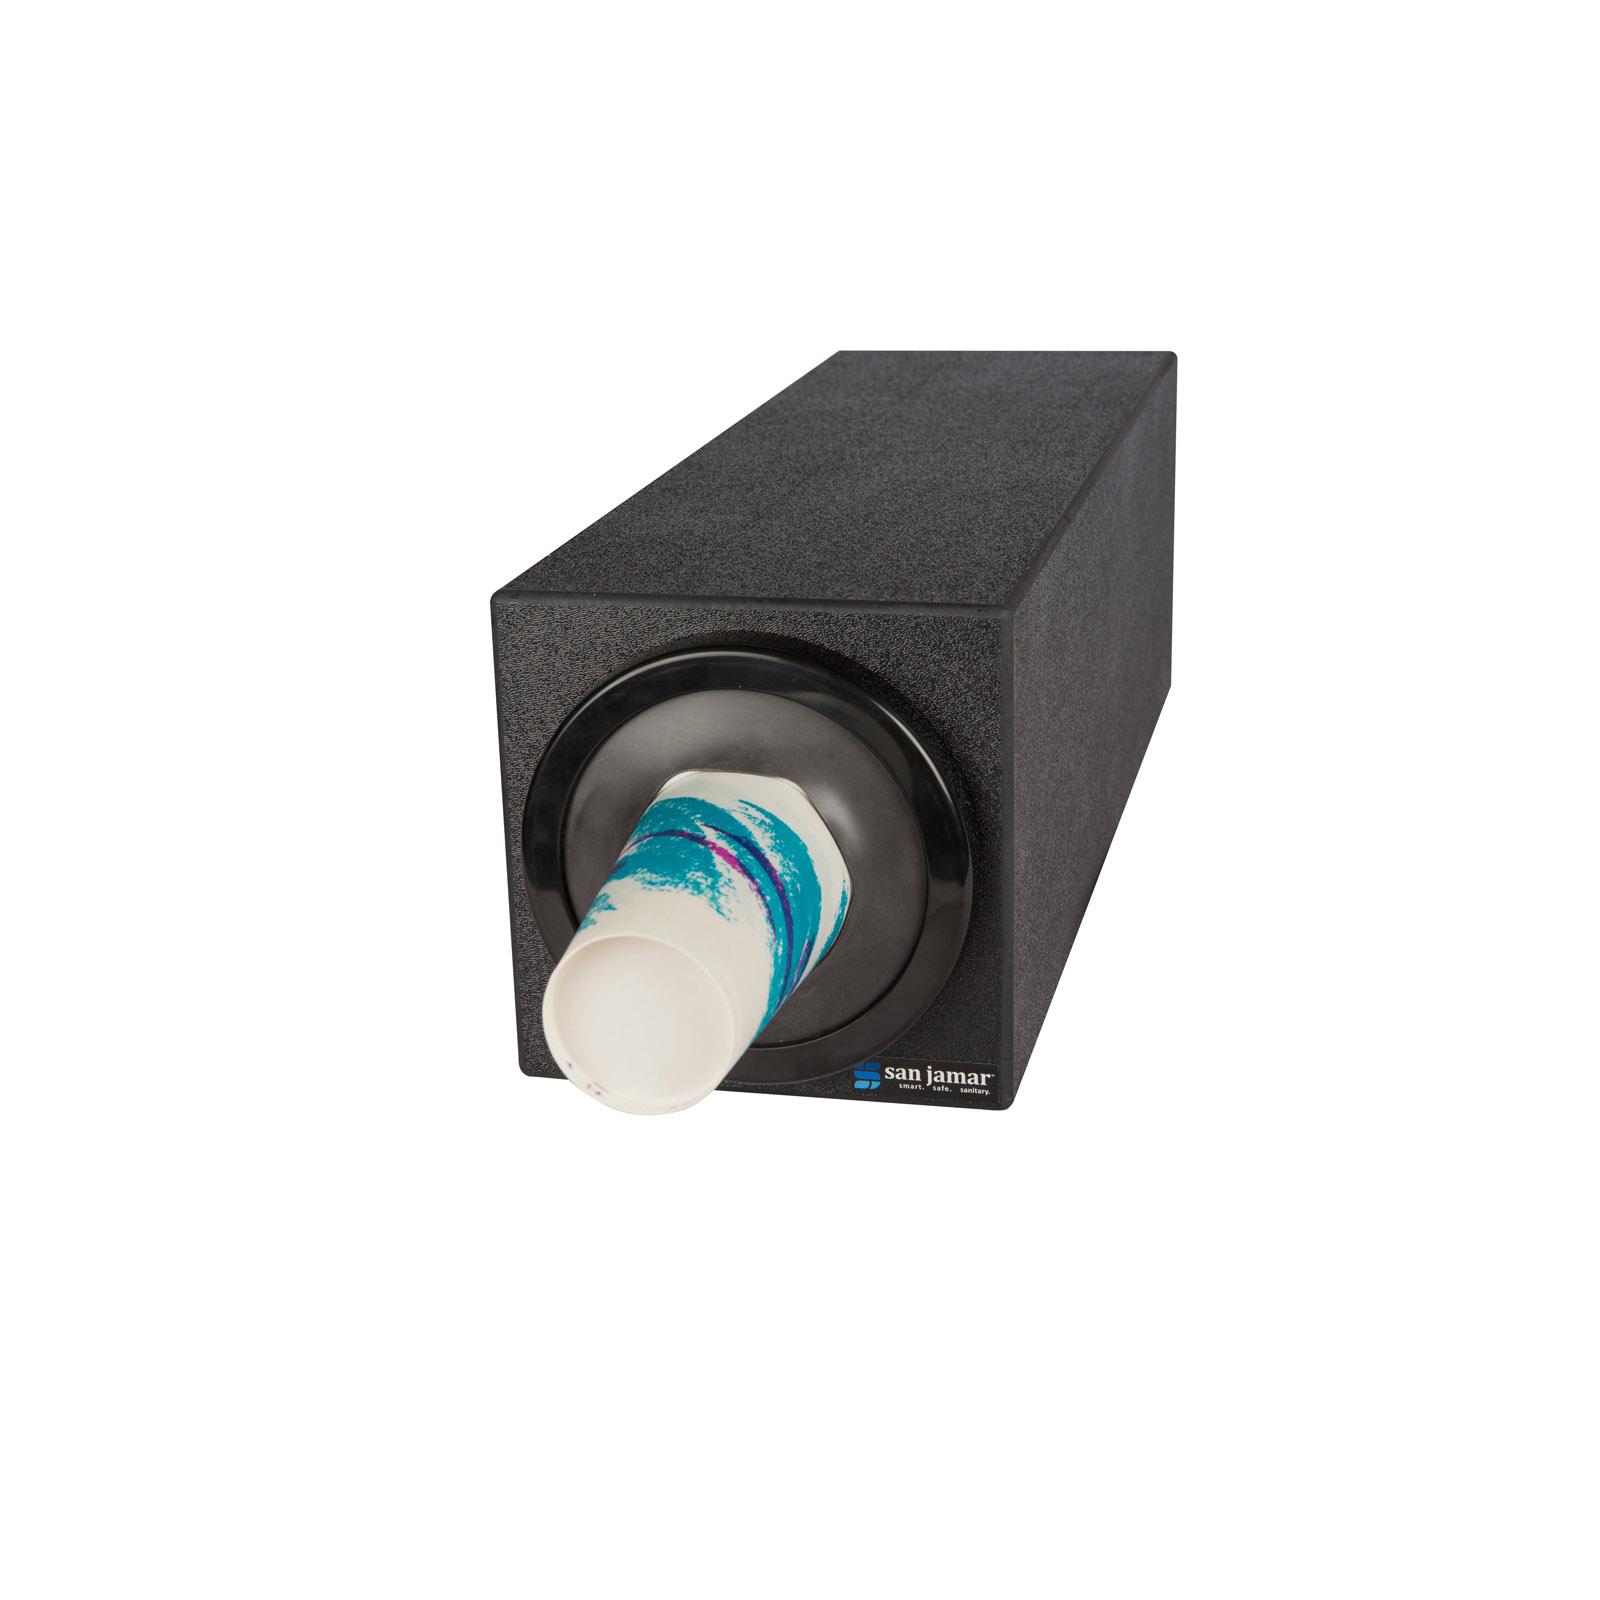 San Jamar C2901BK cup dispensers, countertop